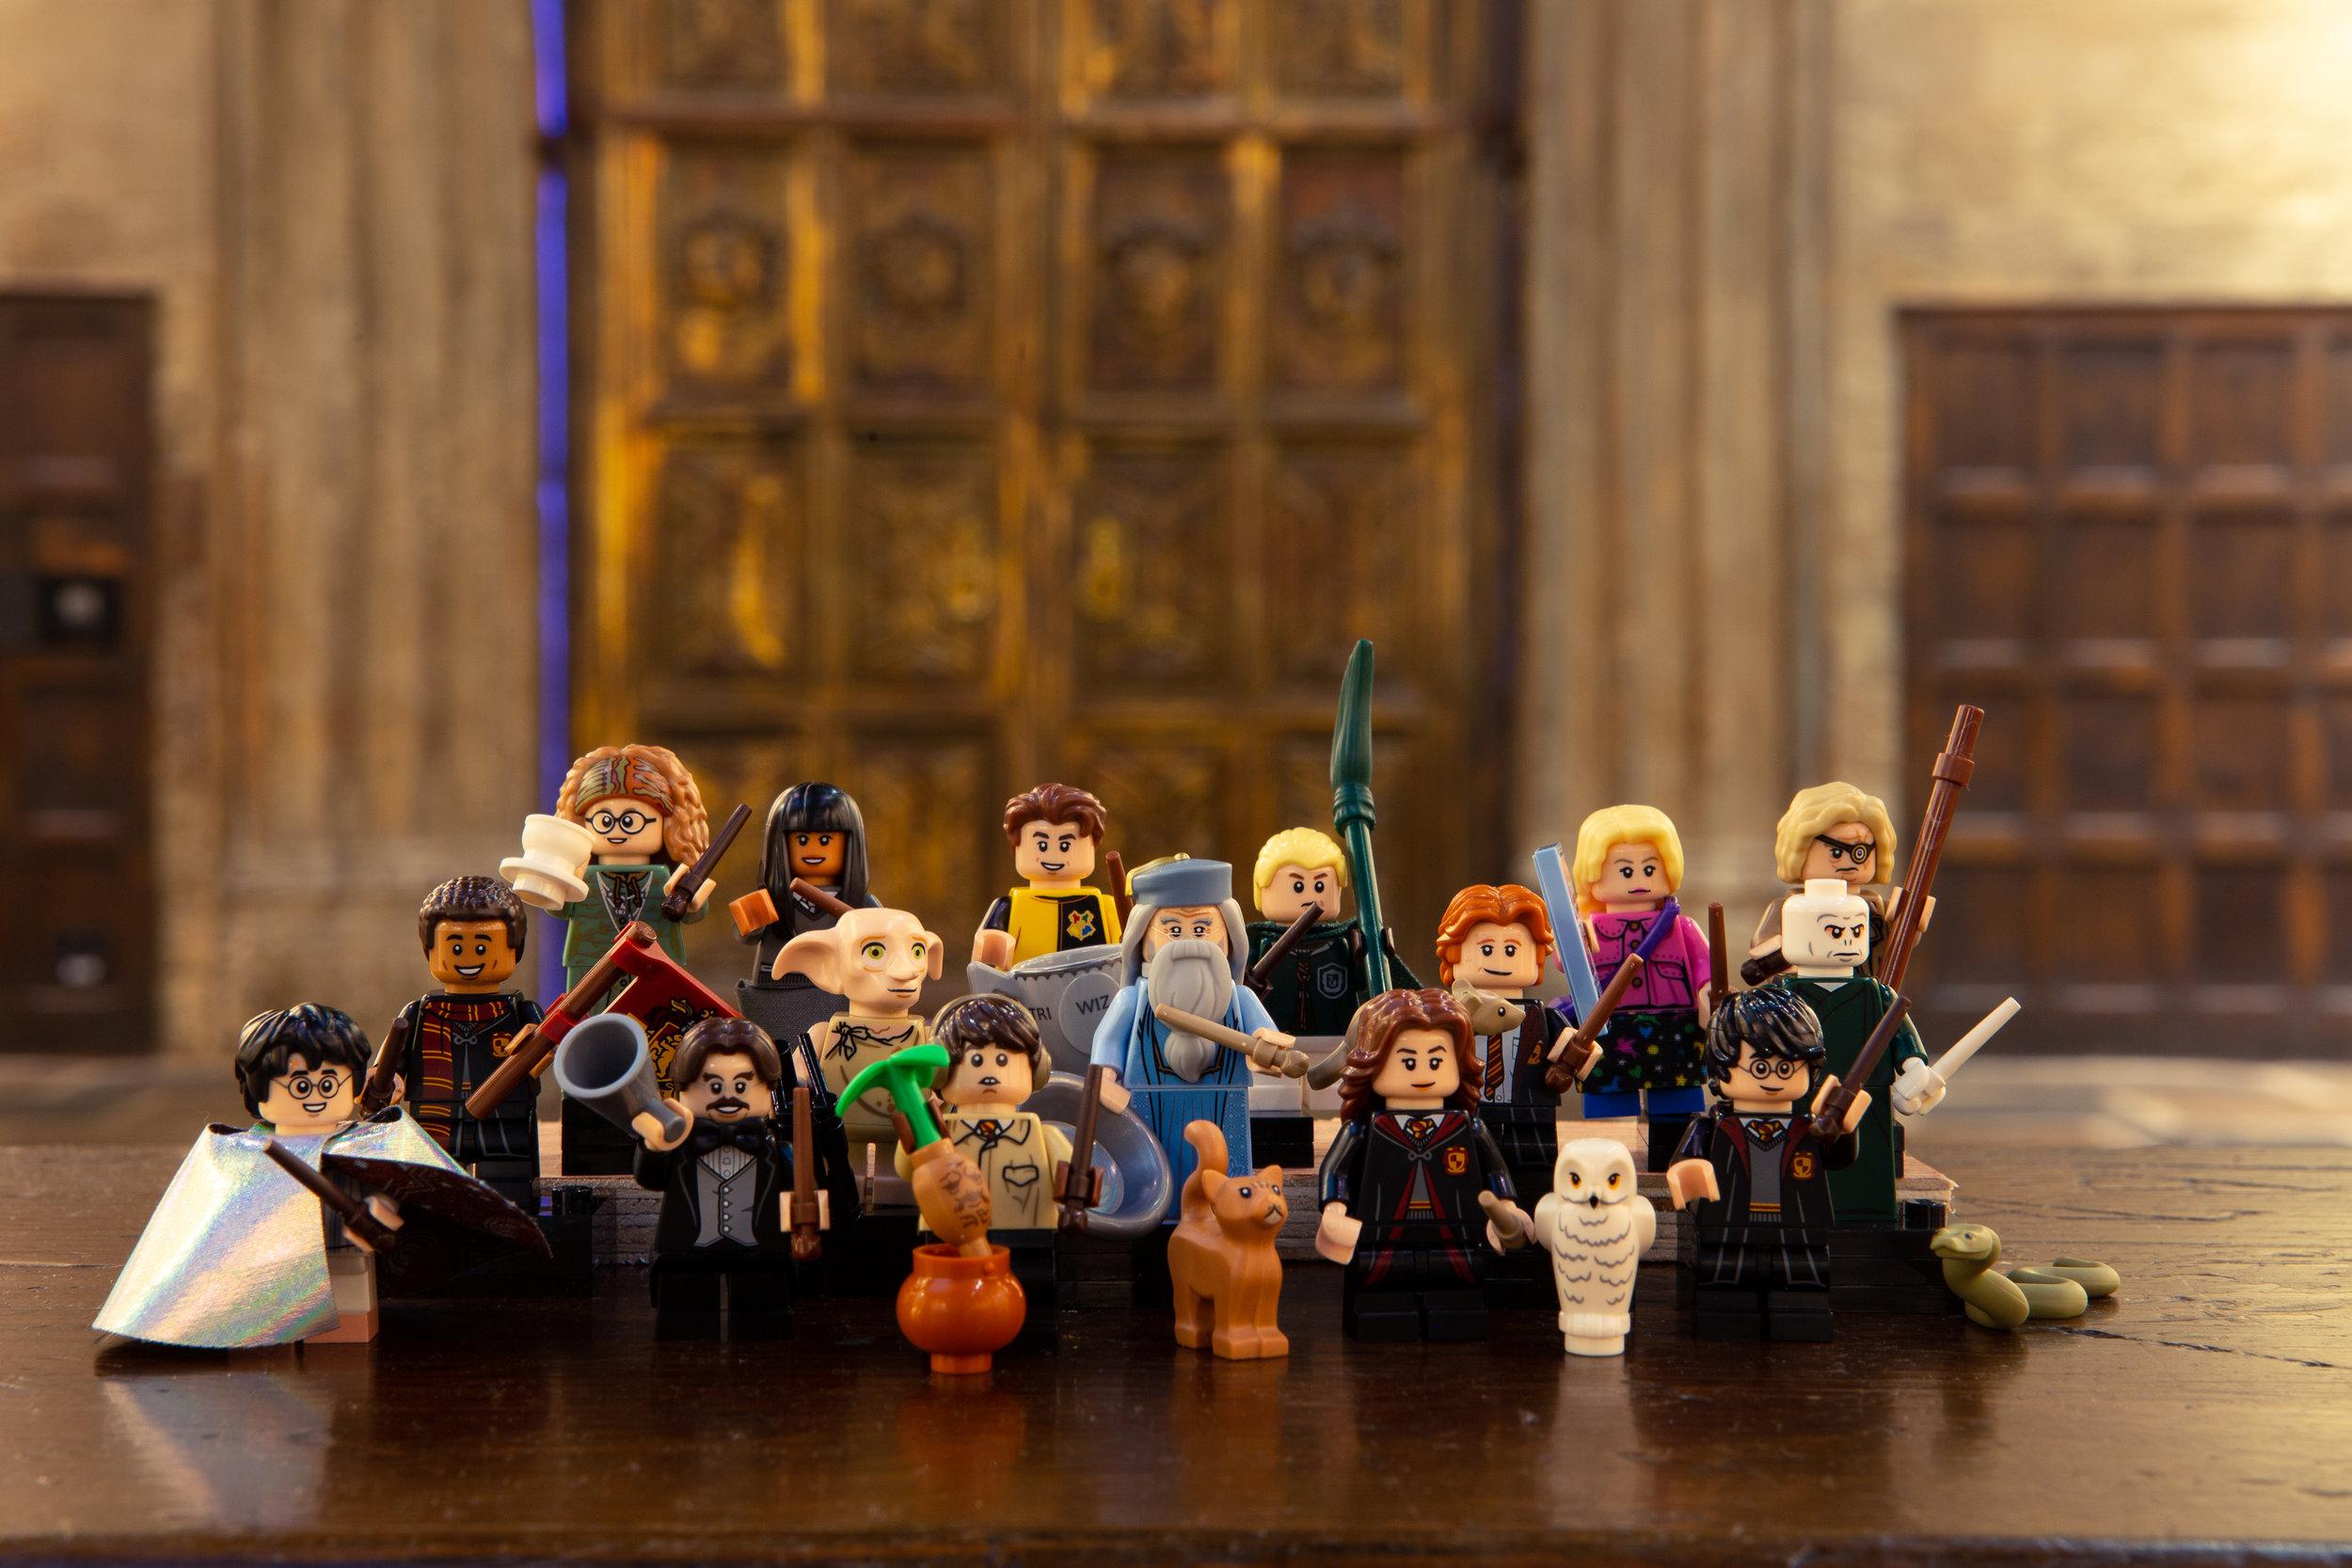 LEGO_WBST_19.06.18_hi-res-3.jpg